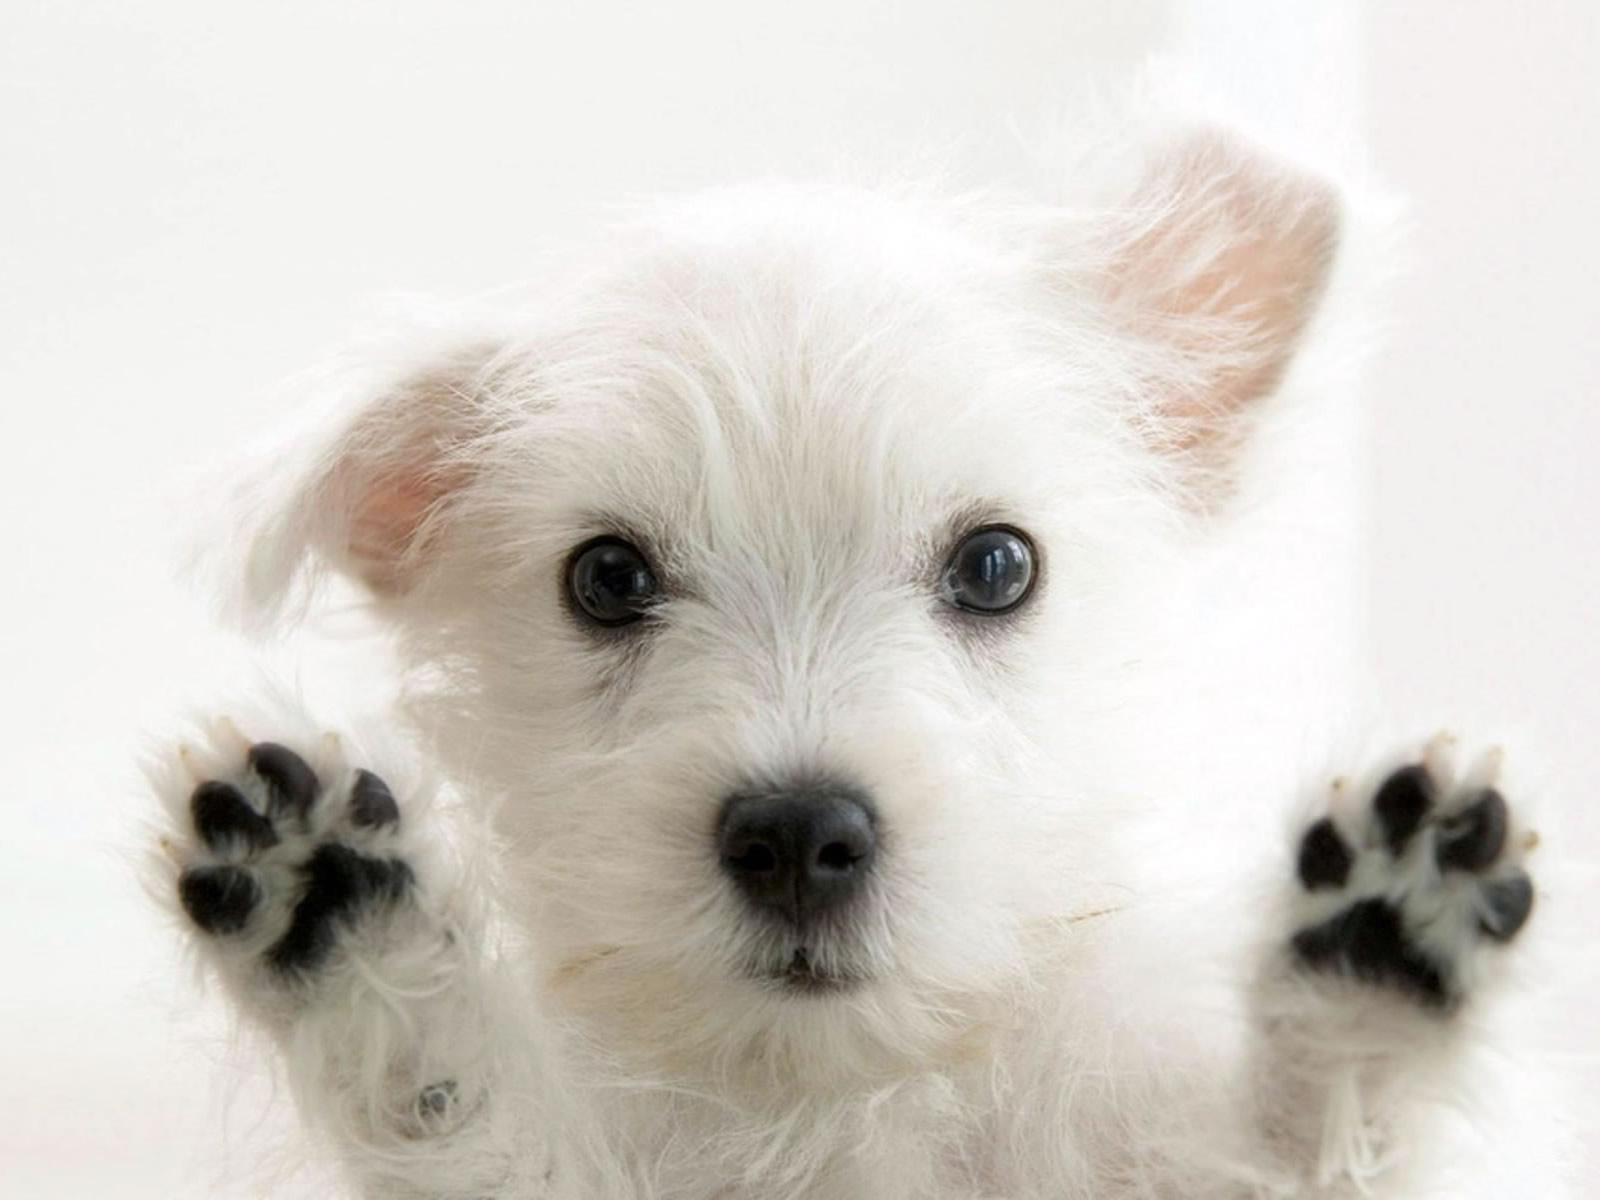 Puppy Dog HD Wallpapers Download Wallpaper DaWallpaperz 1600x1200